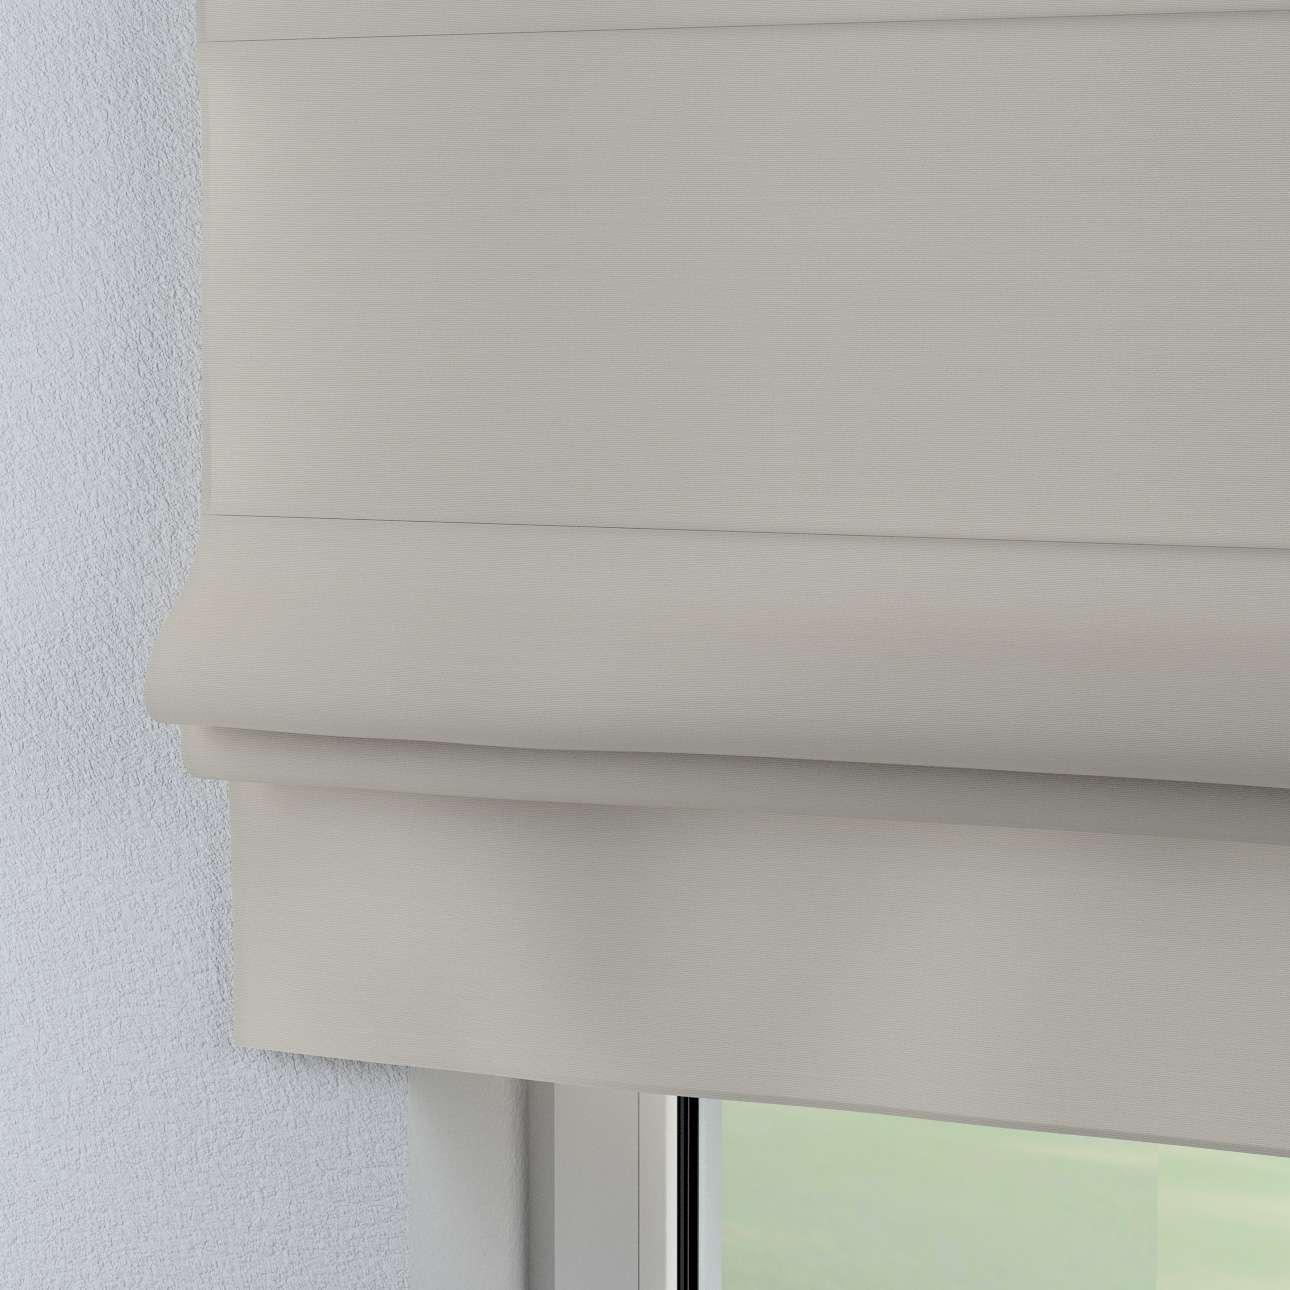 Raffrollo Padva 80 x 170 cm von der Kollektion Cotton Panama, Stoff: 702-31